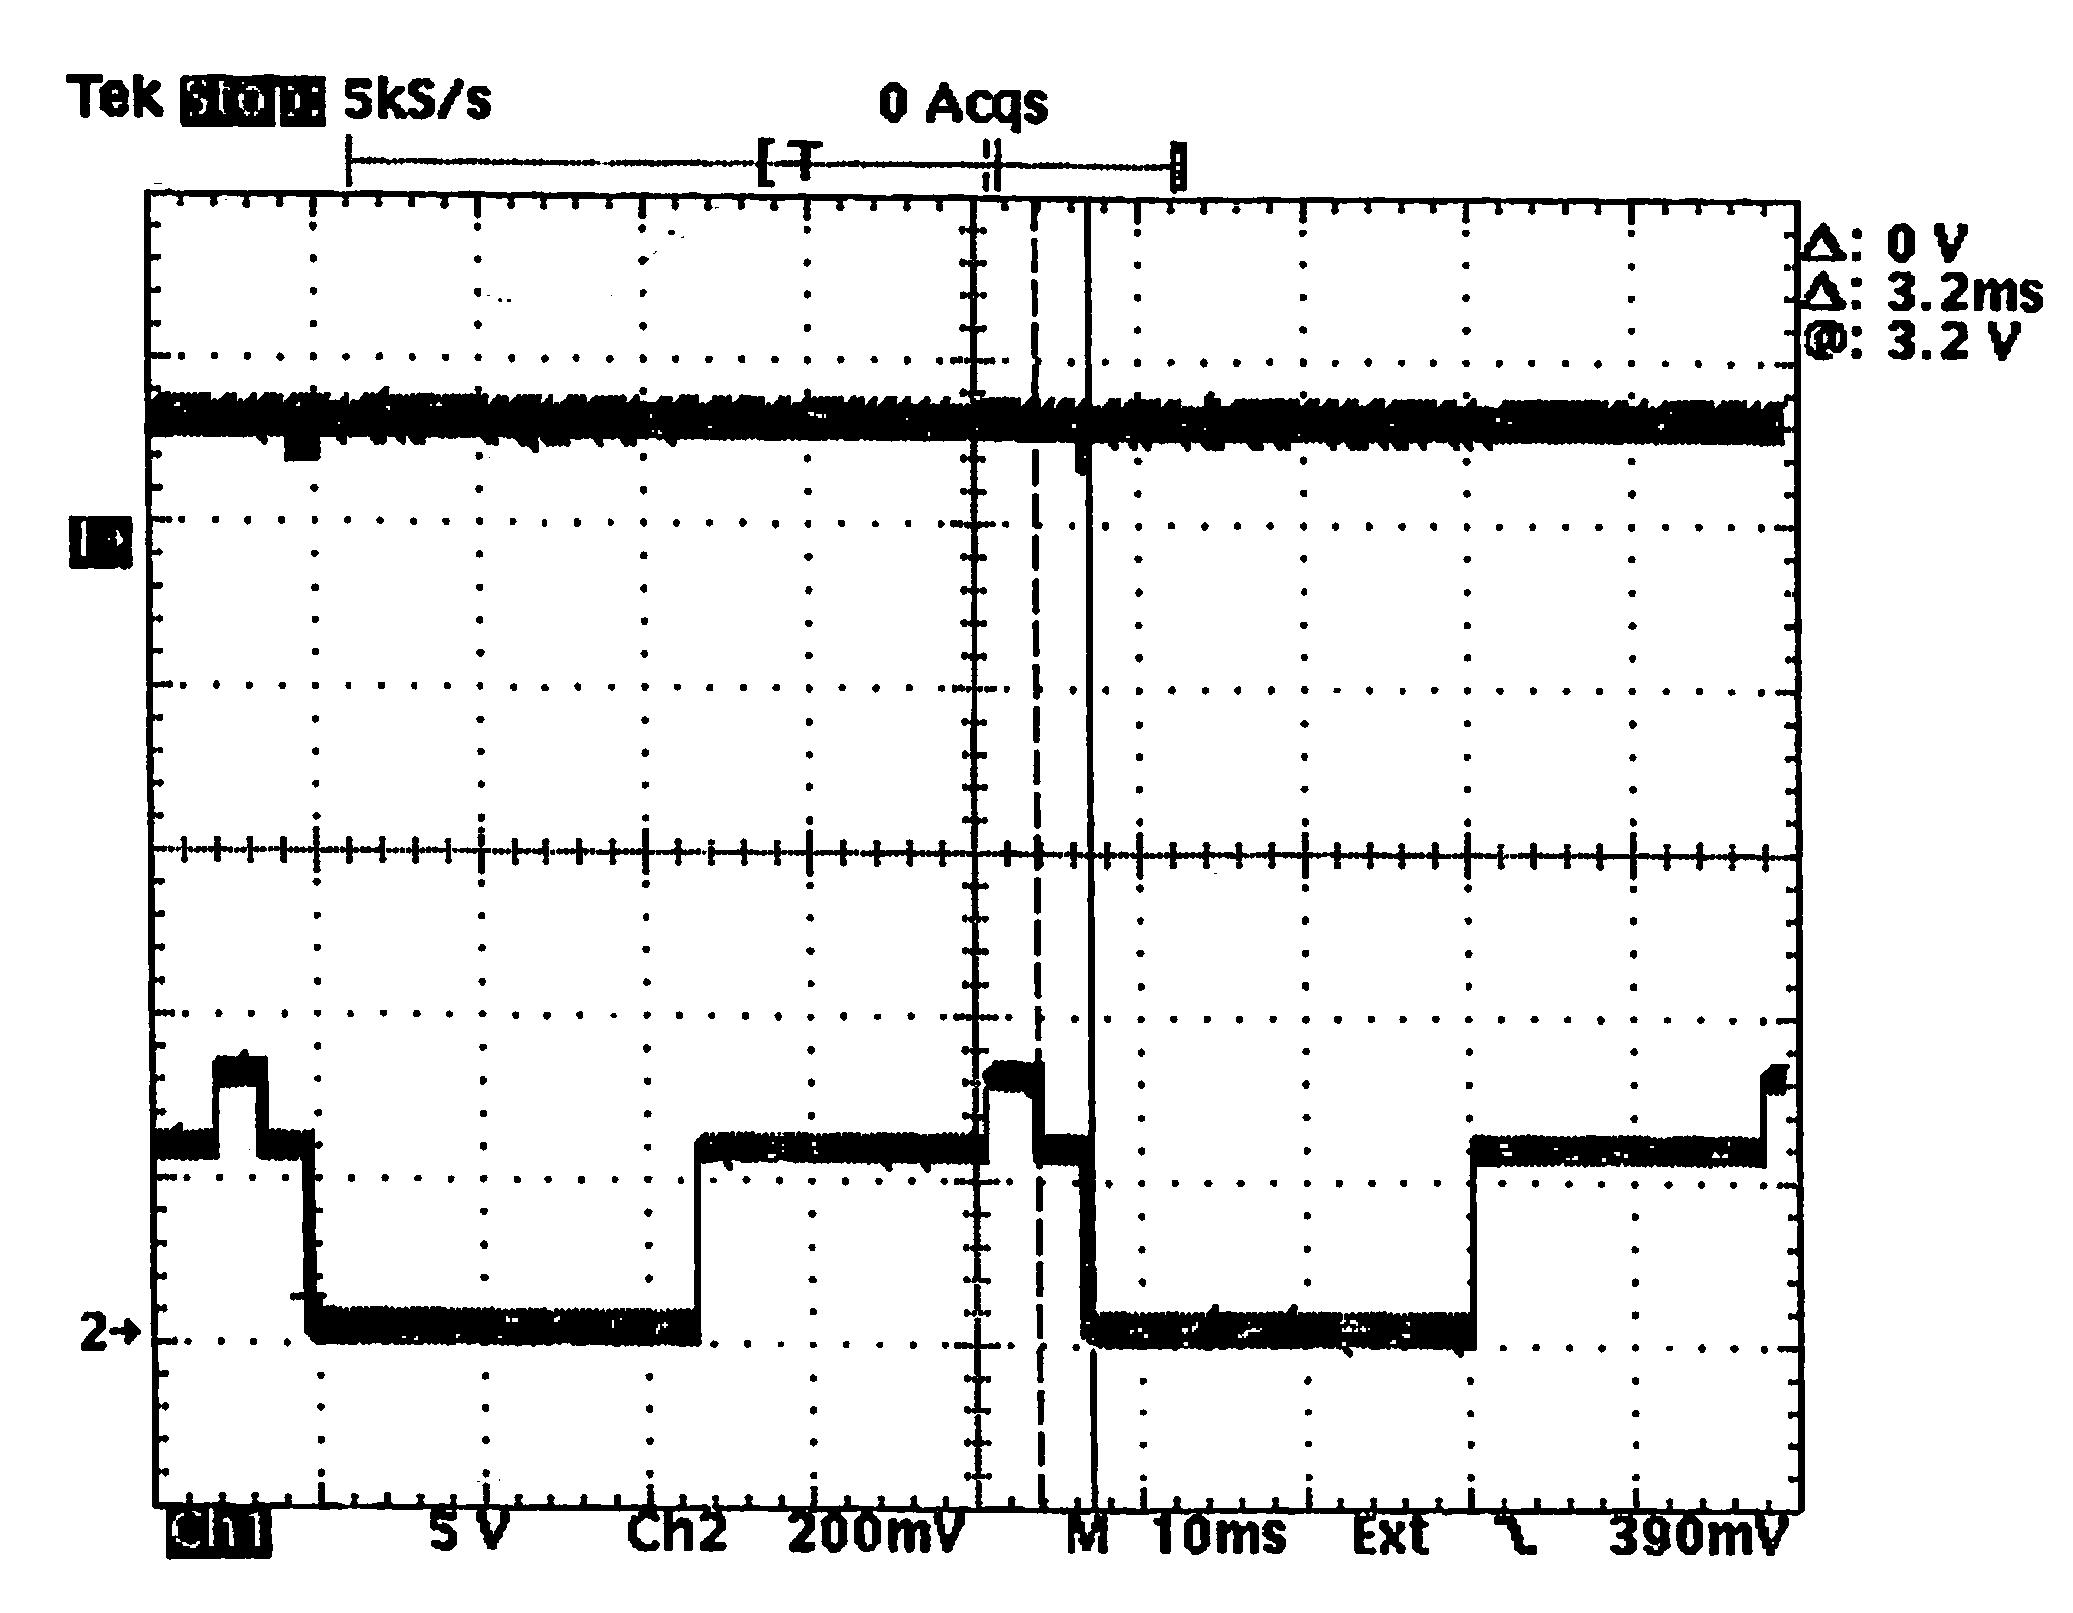 Ziemlich Onan Motor Schaltplan Sensoren Fotos - Elektrische ...